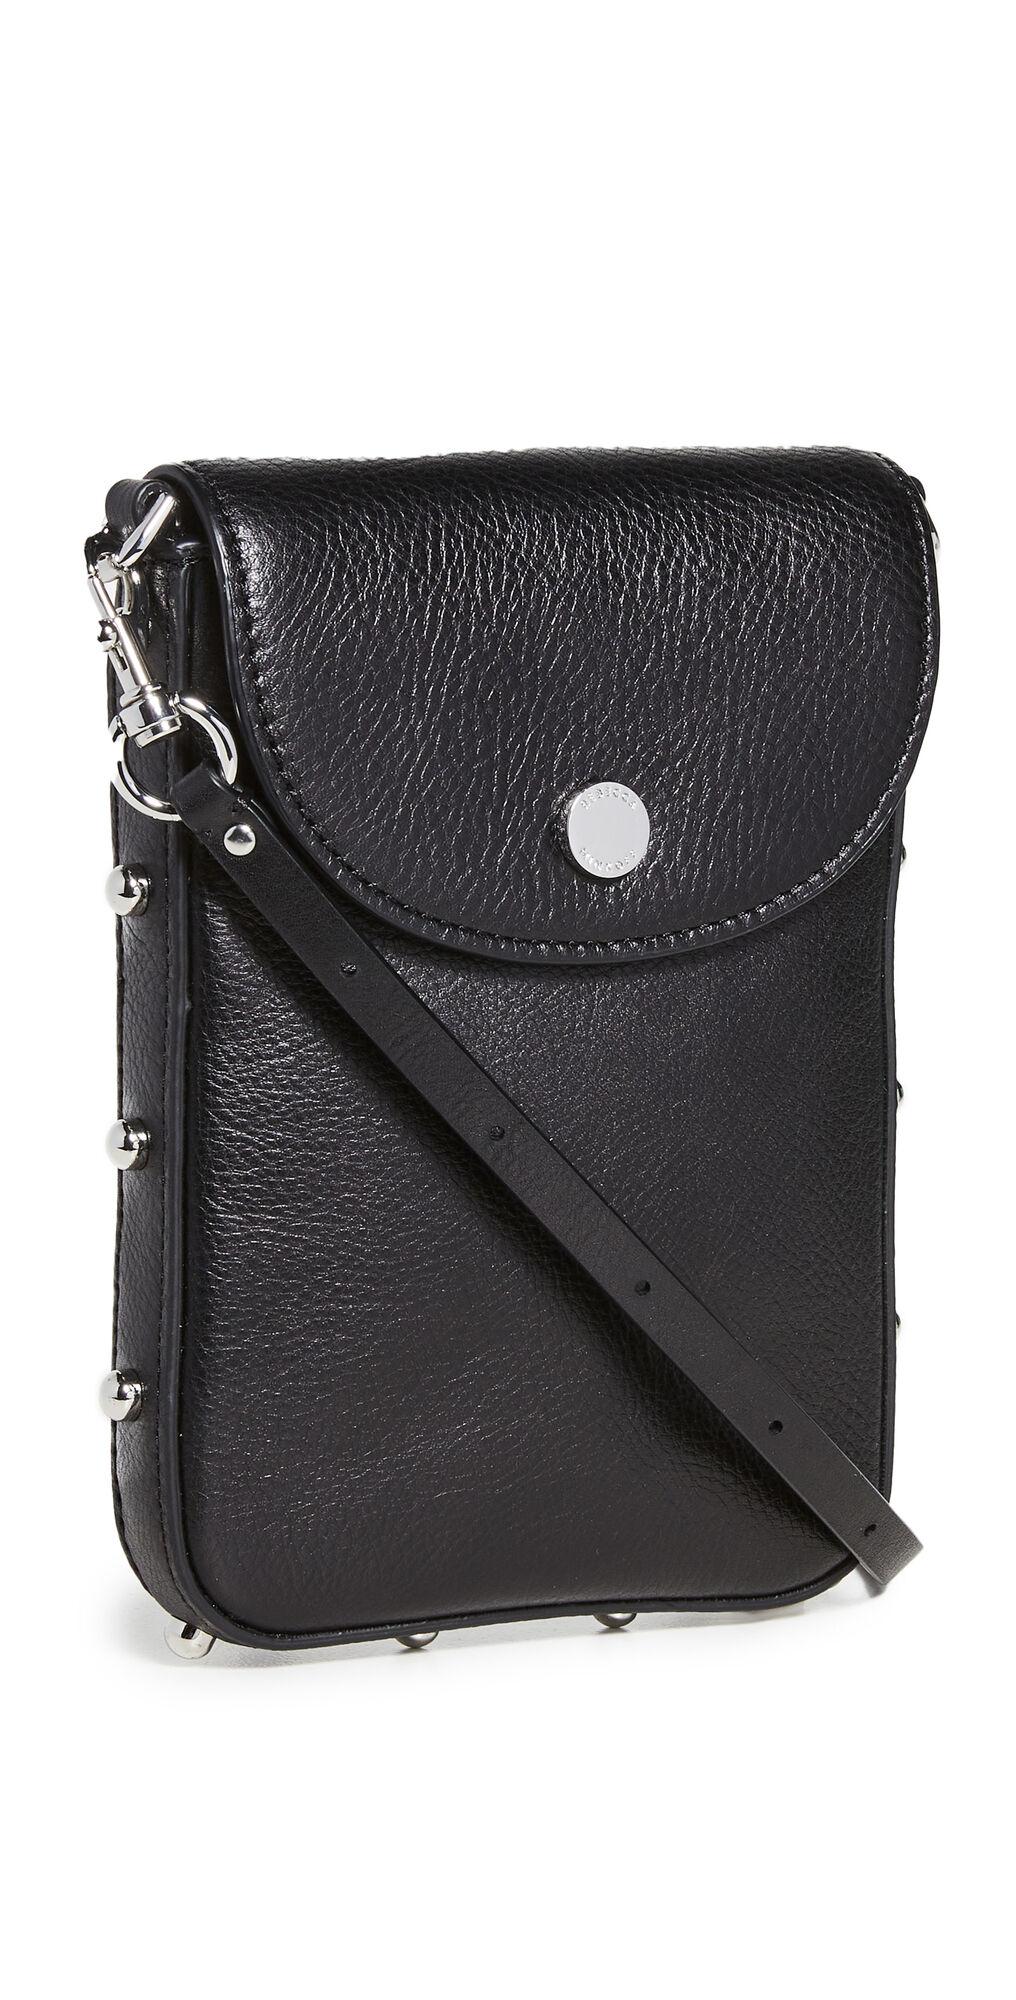 Rebecca Minkoff Envelope Phone Crossbody Bag  - Size: One Size